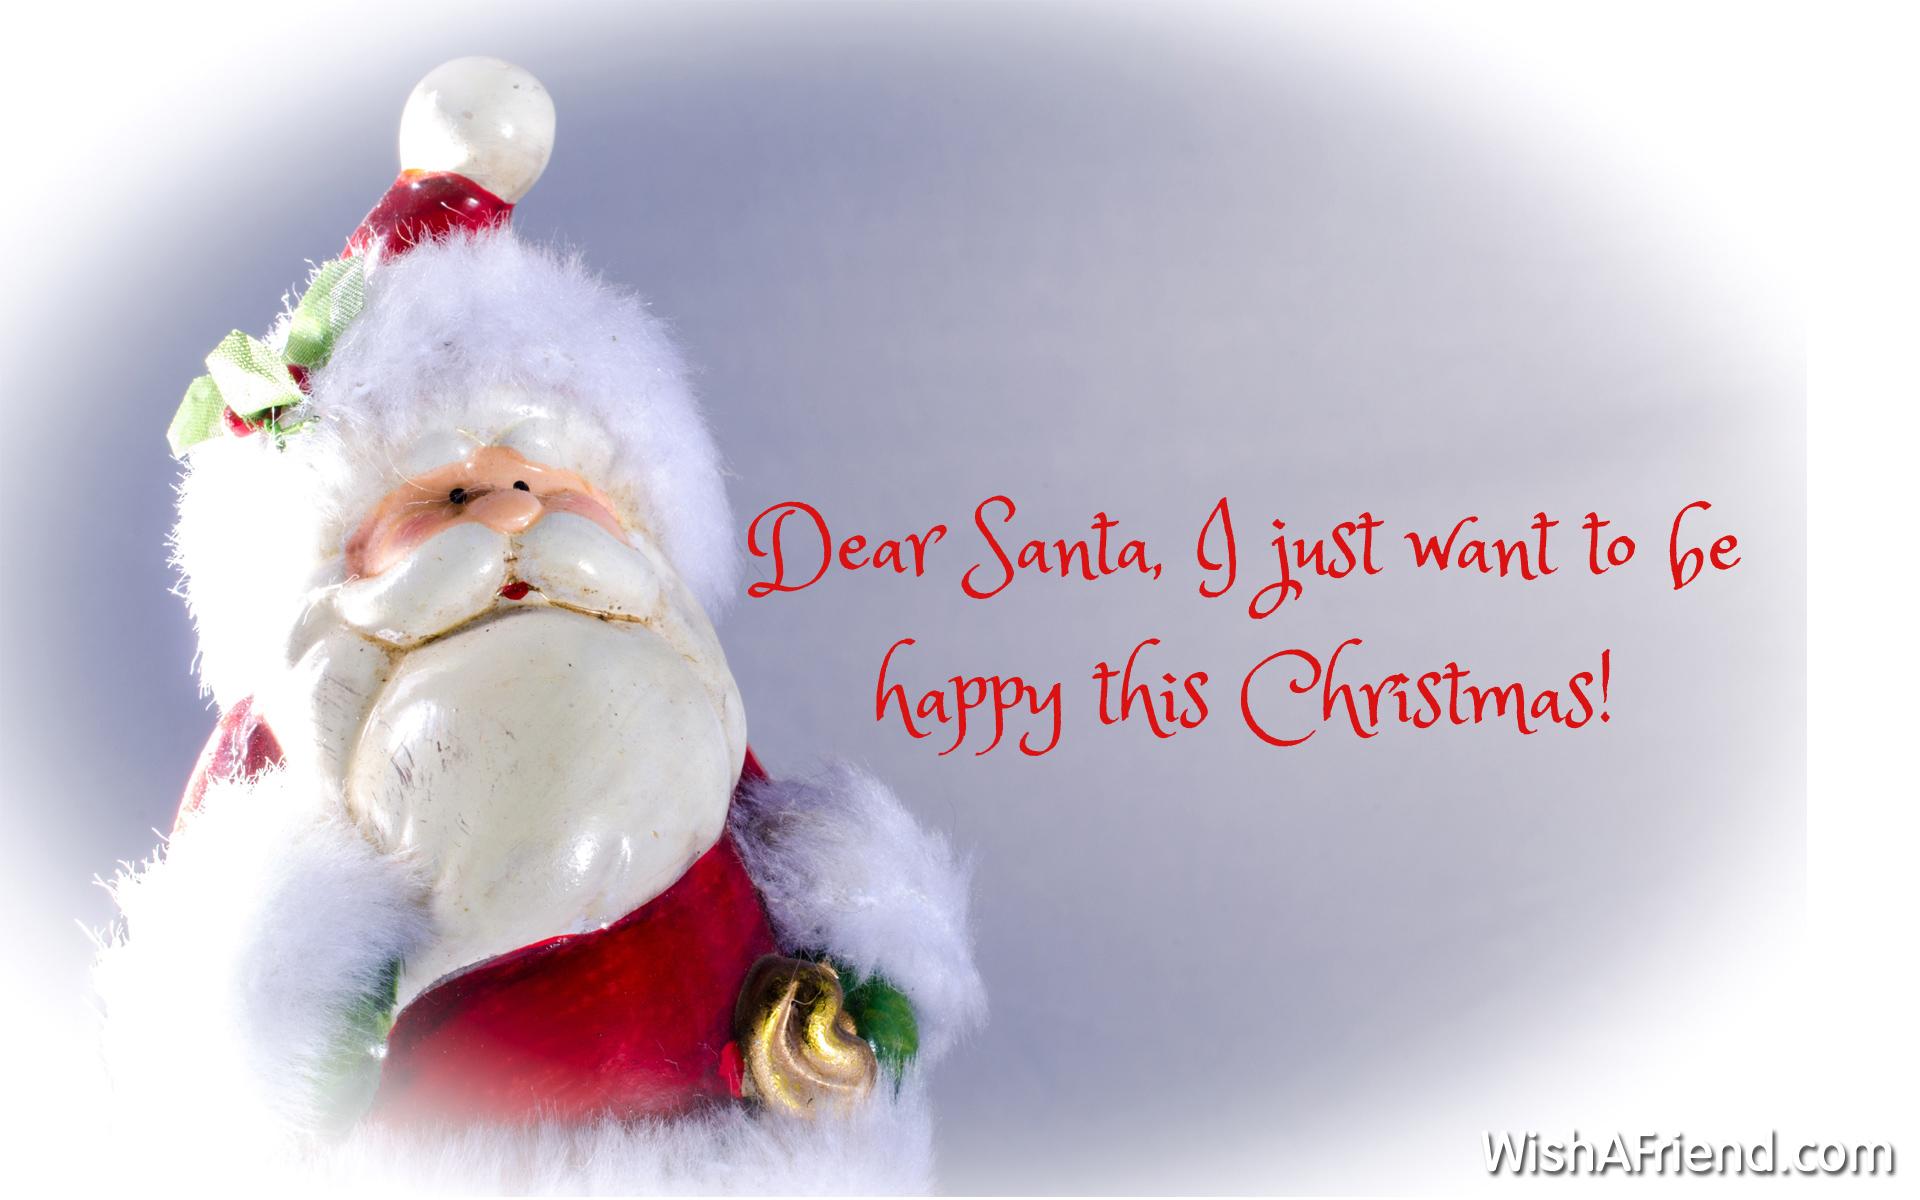 Dear Santa, I just want